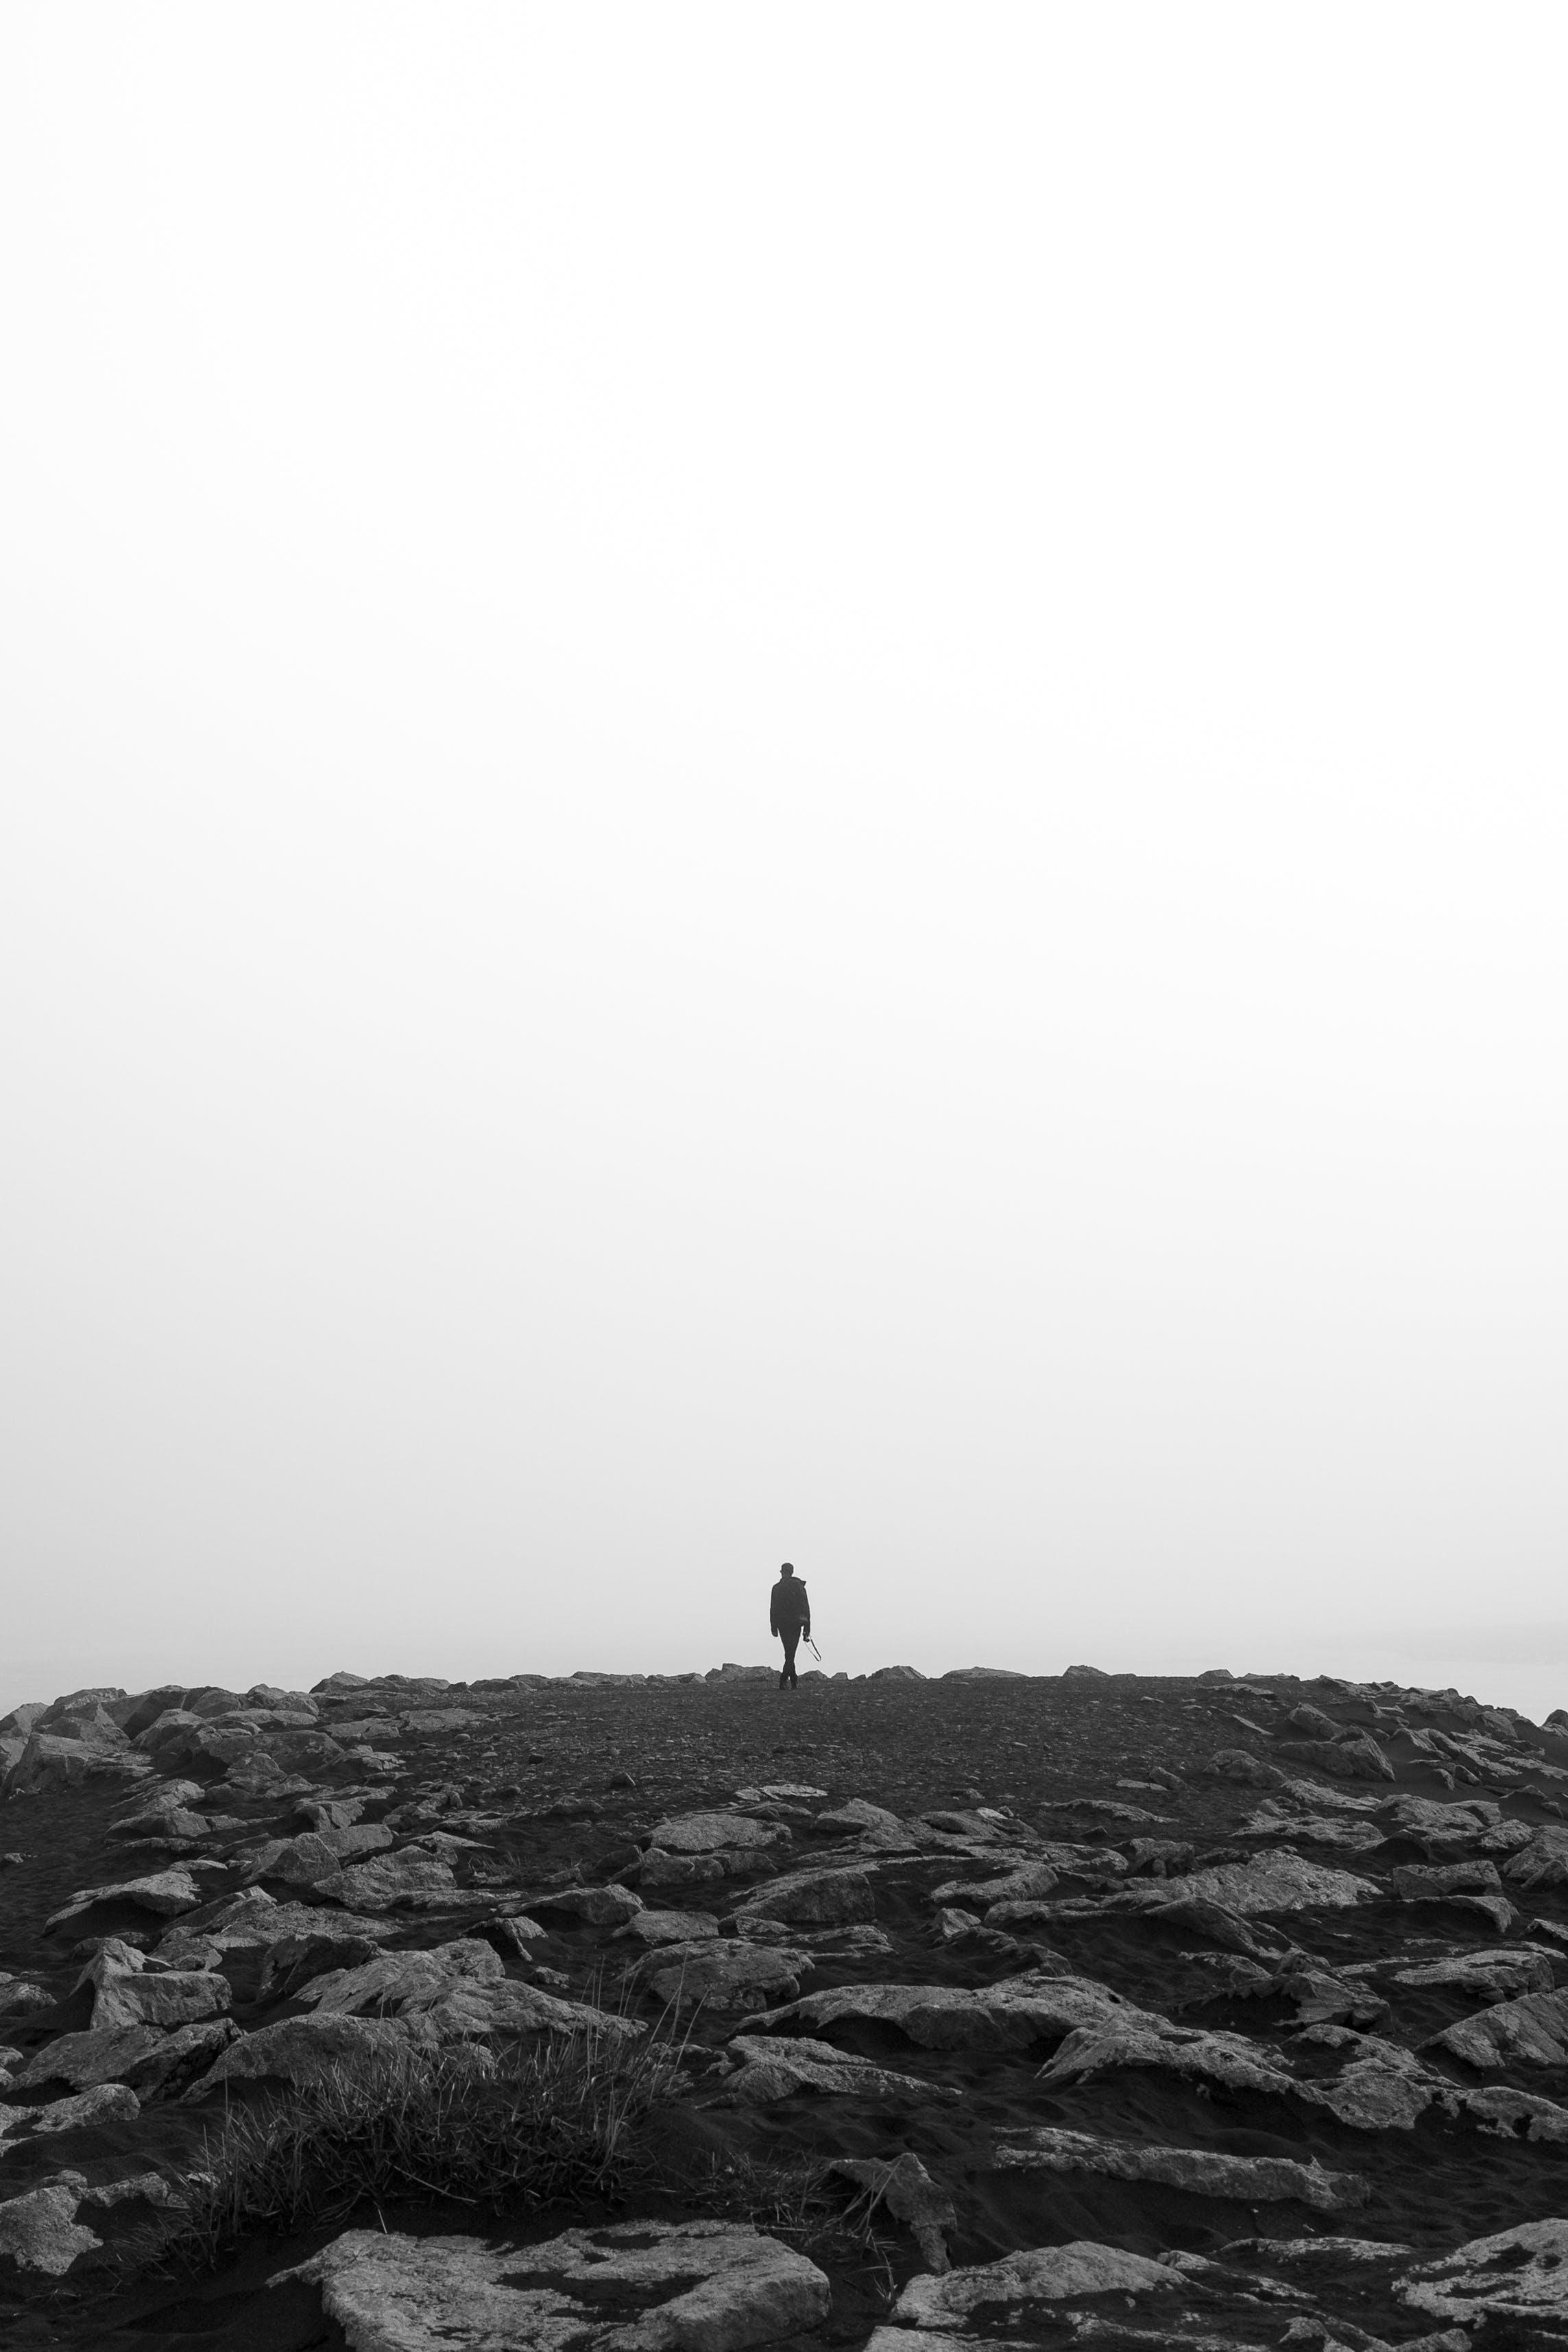 Free stock photo of person, beach, rocks, silhouette